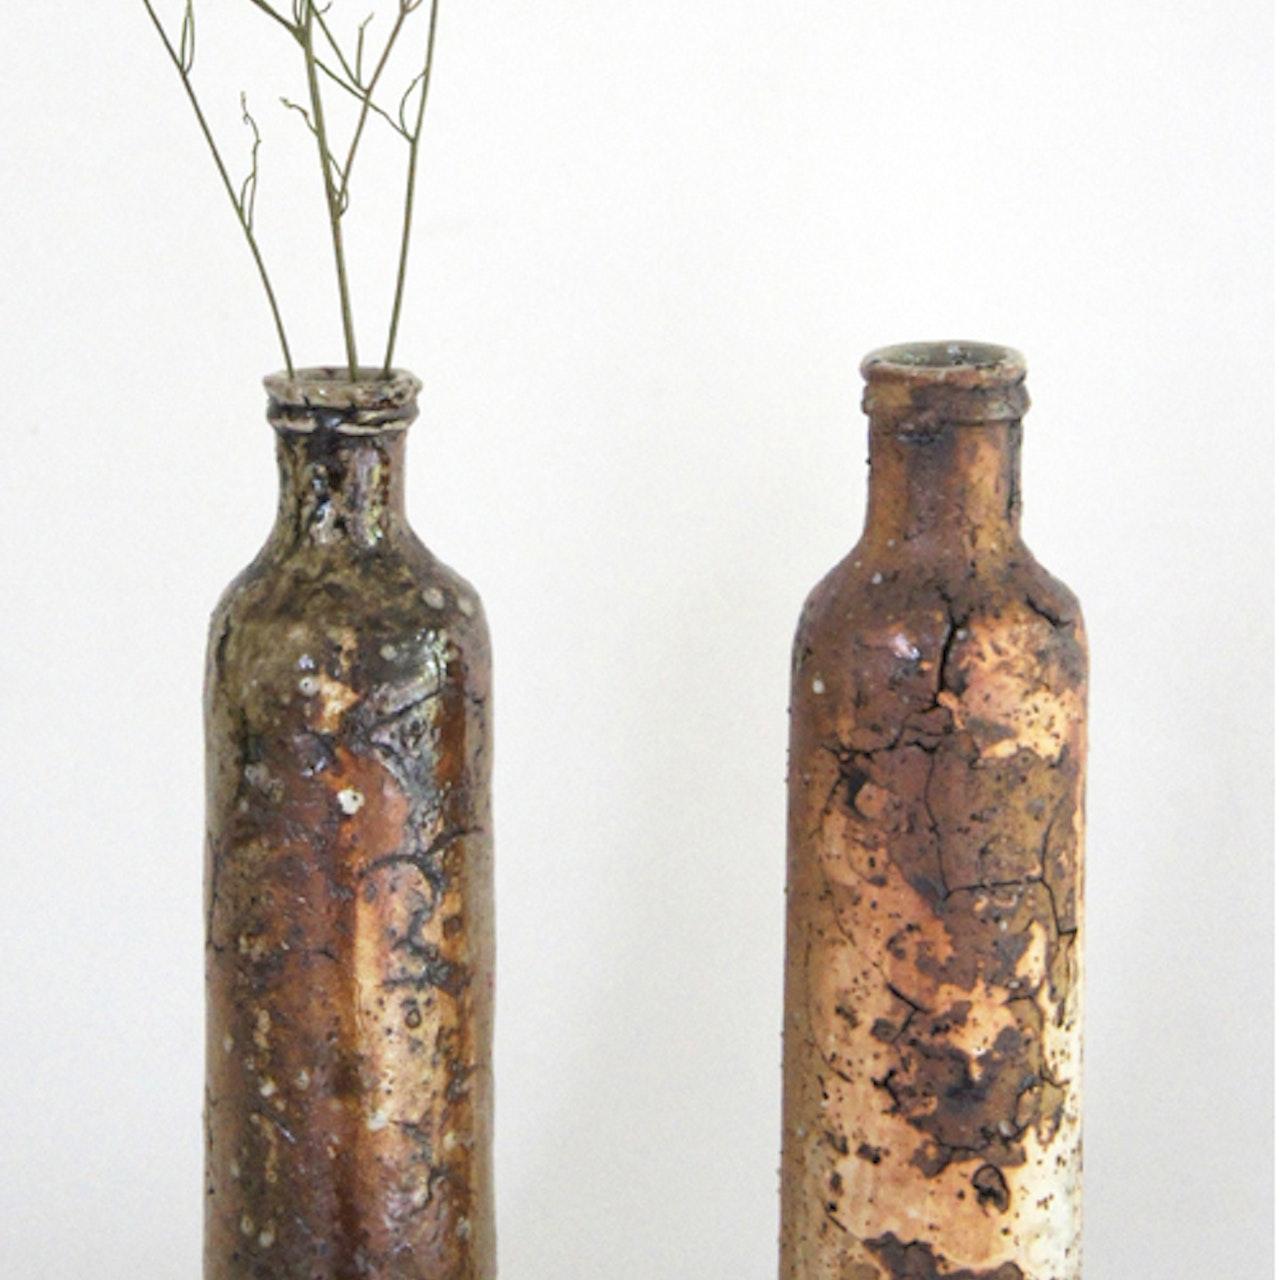 Shigaraki tall bottles